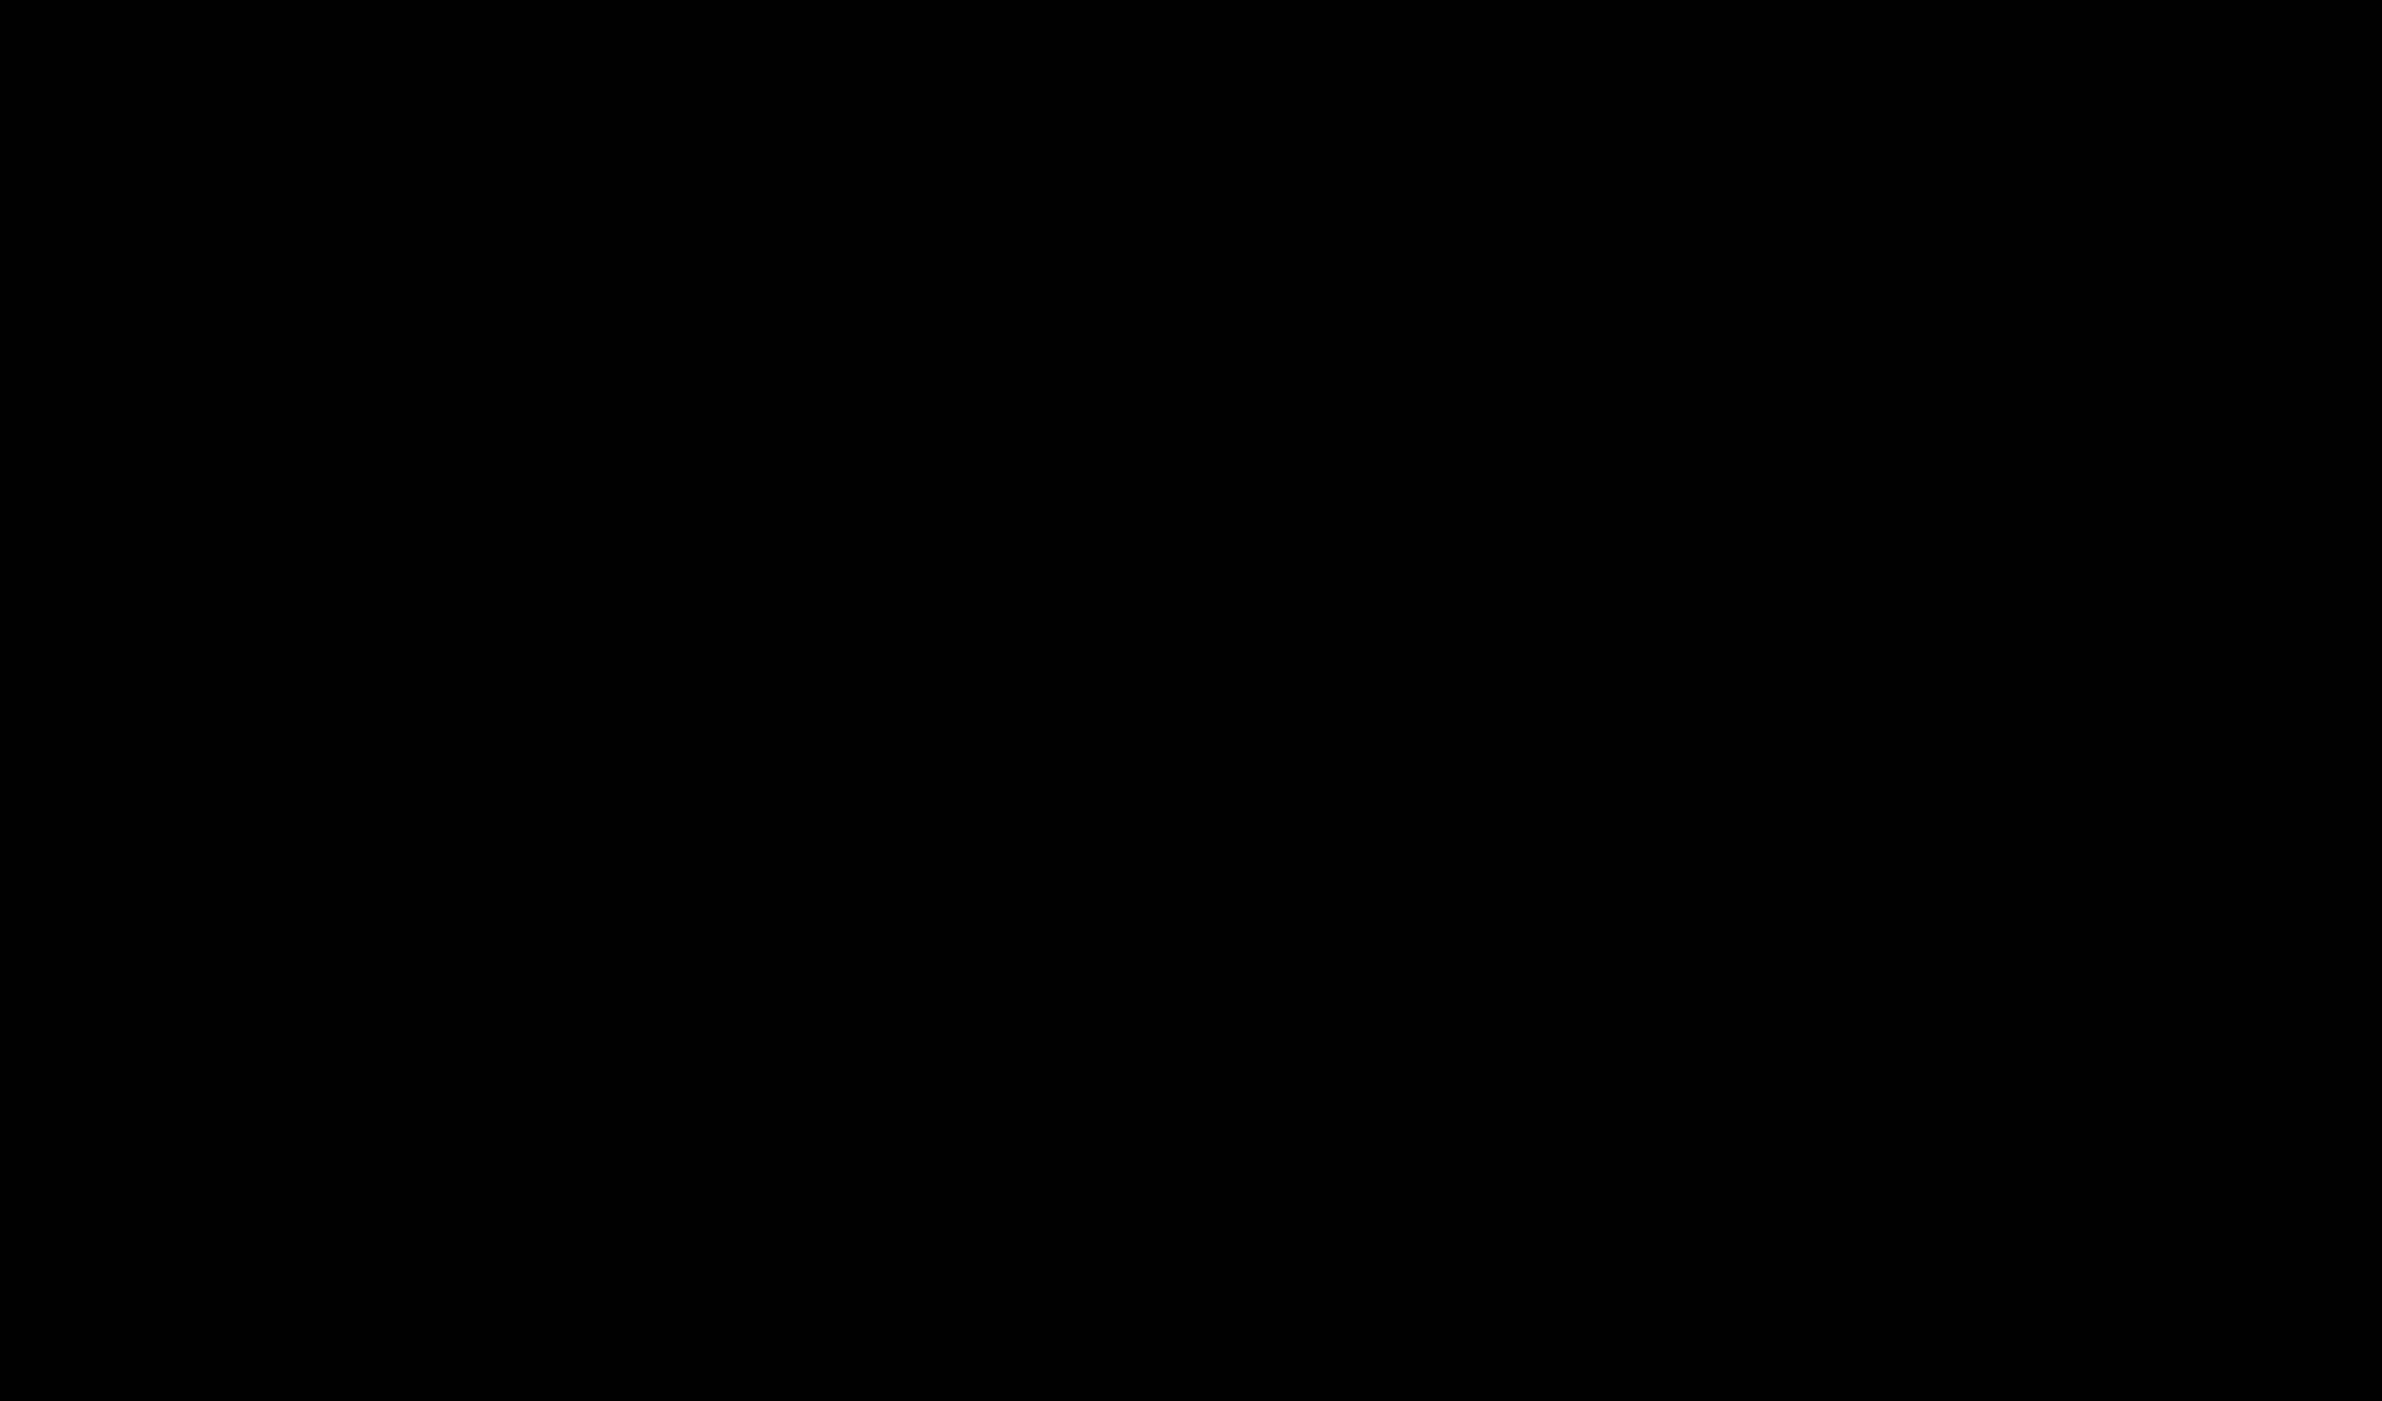 Family unit in silhouette